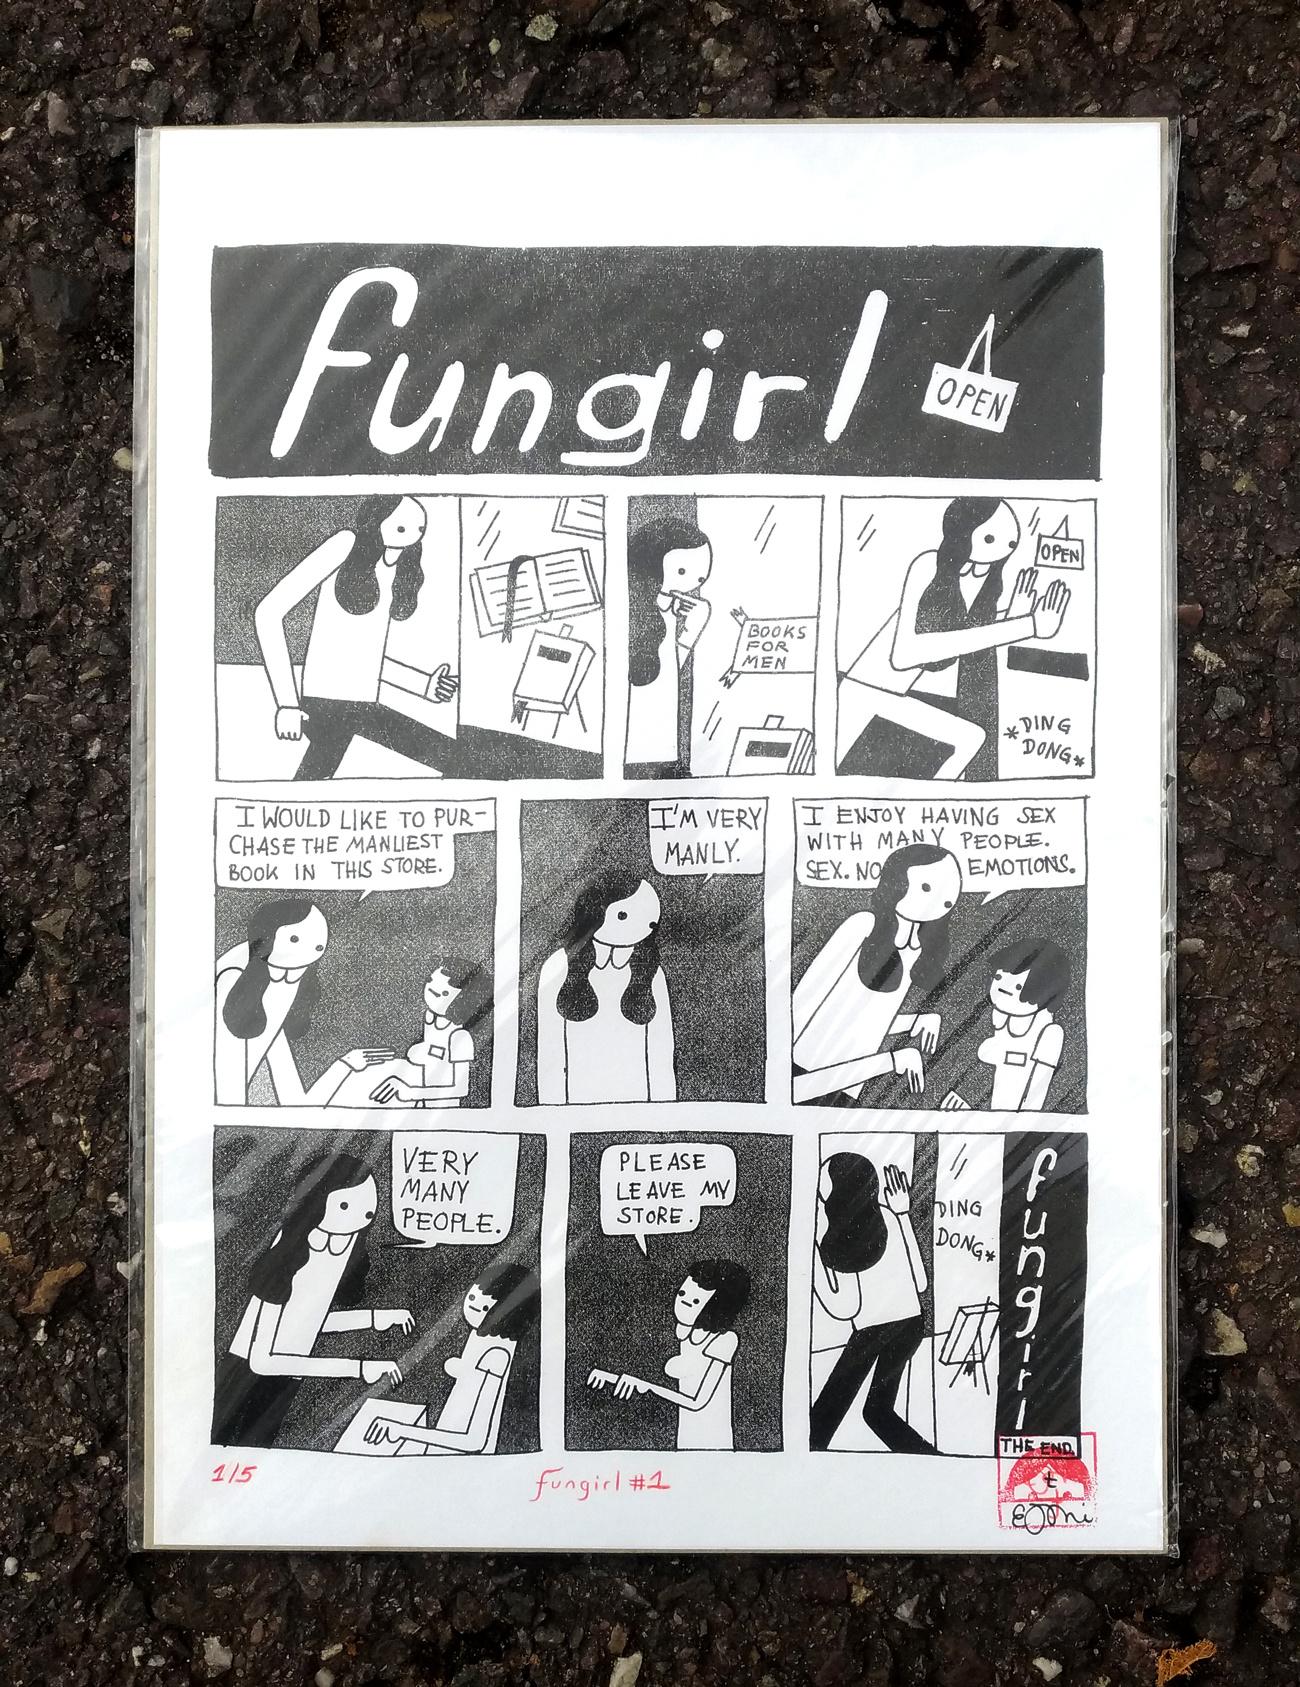 Fungirl - Books For Men - Elizabeth Pich